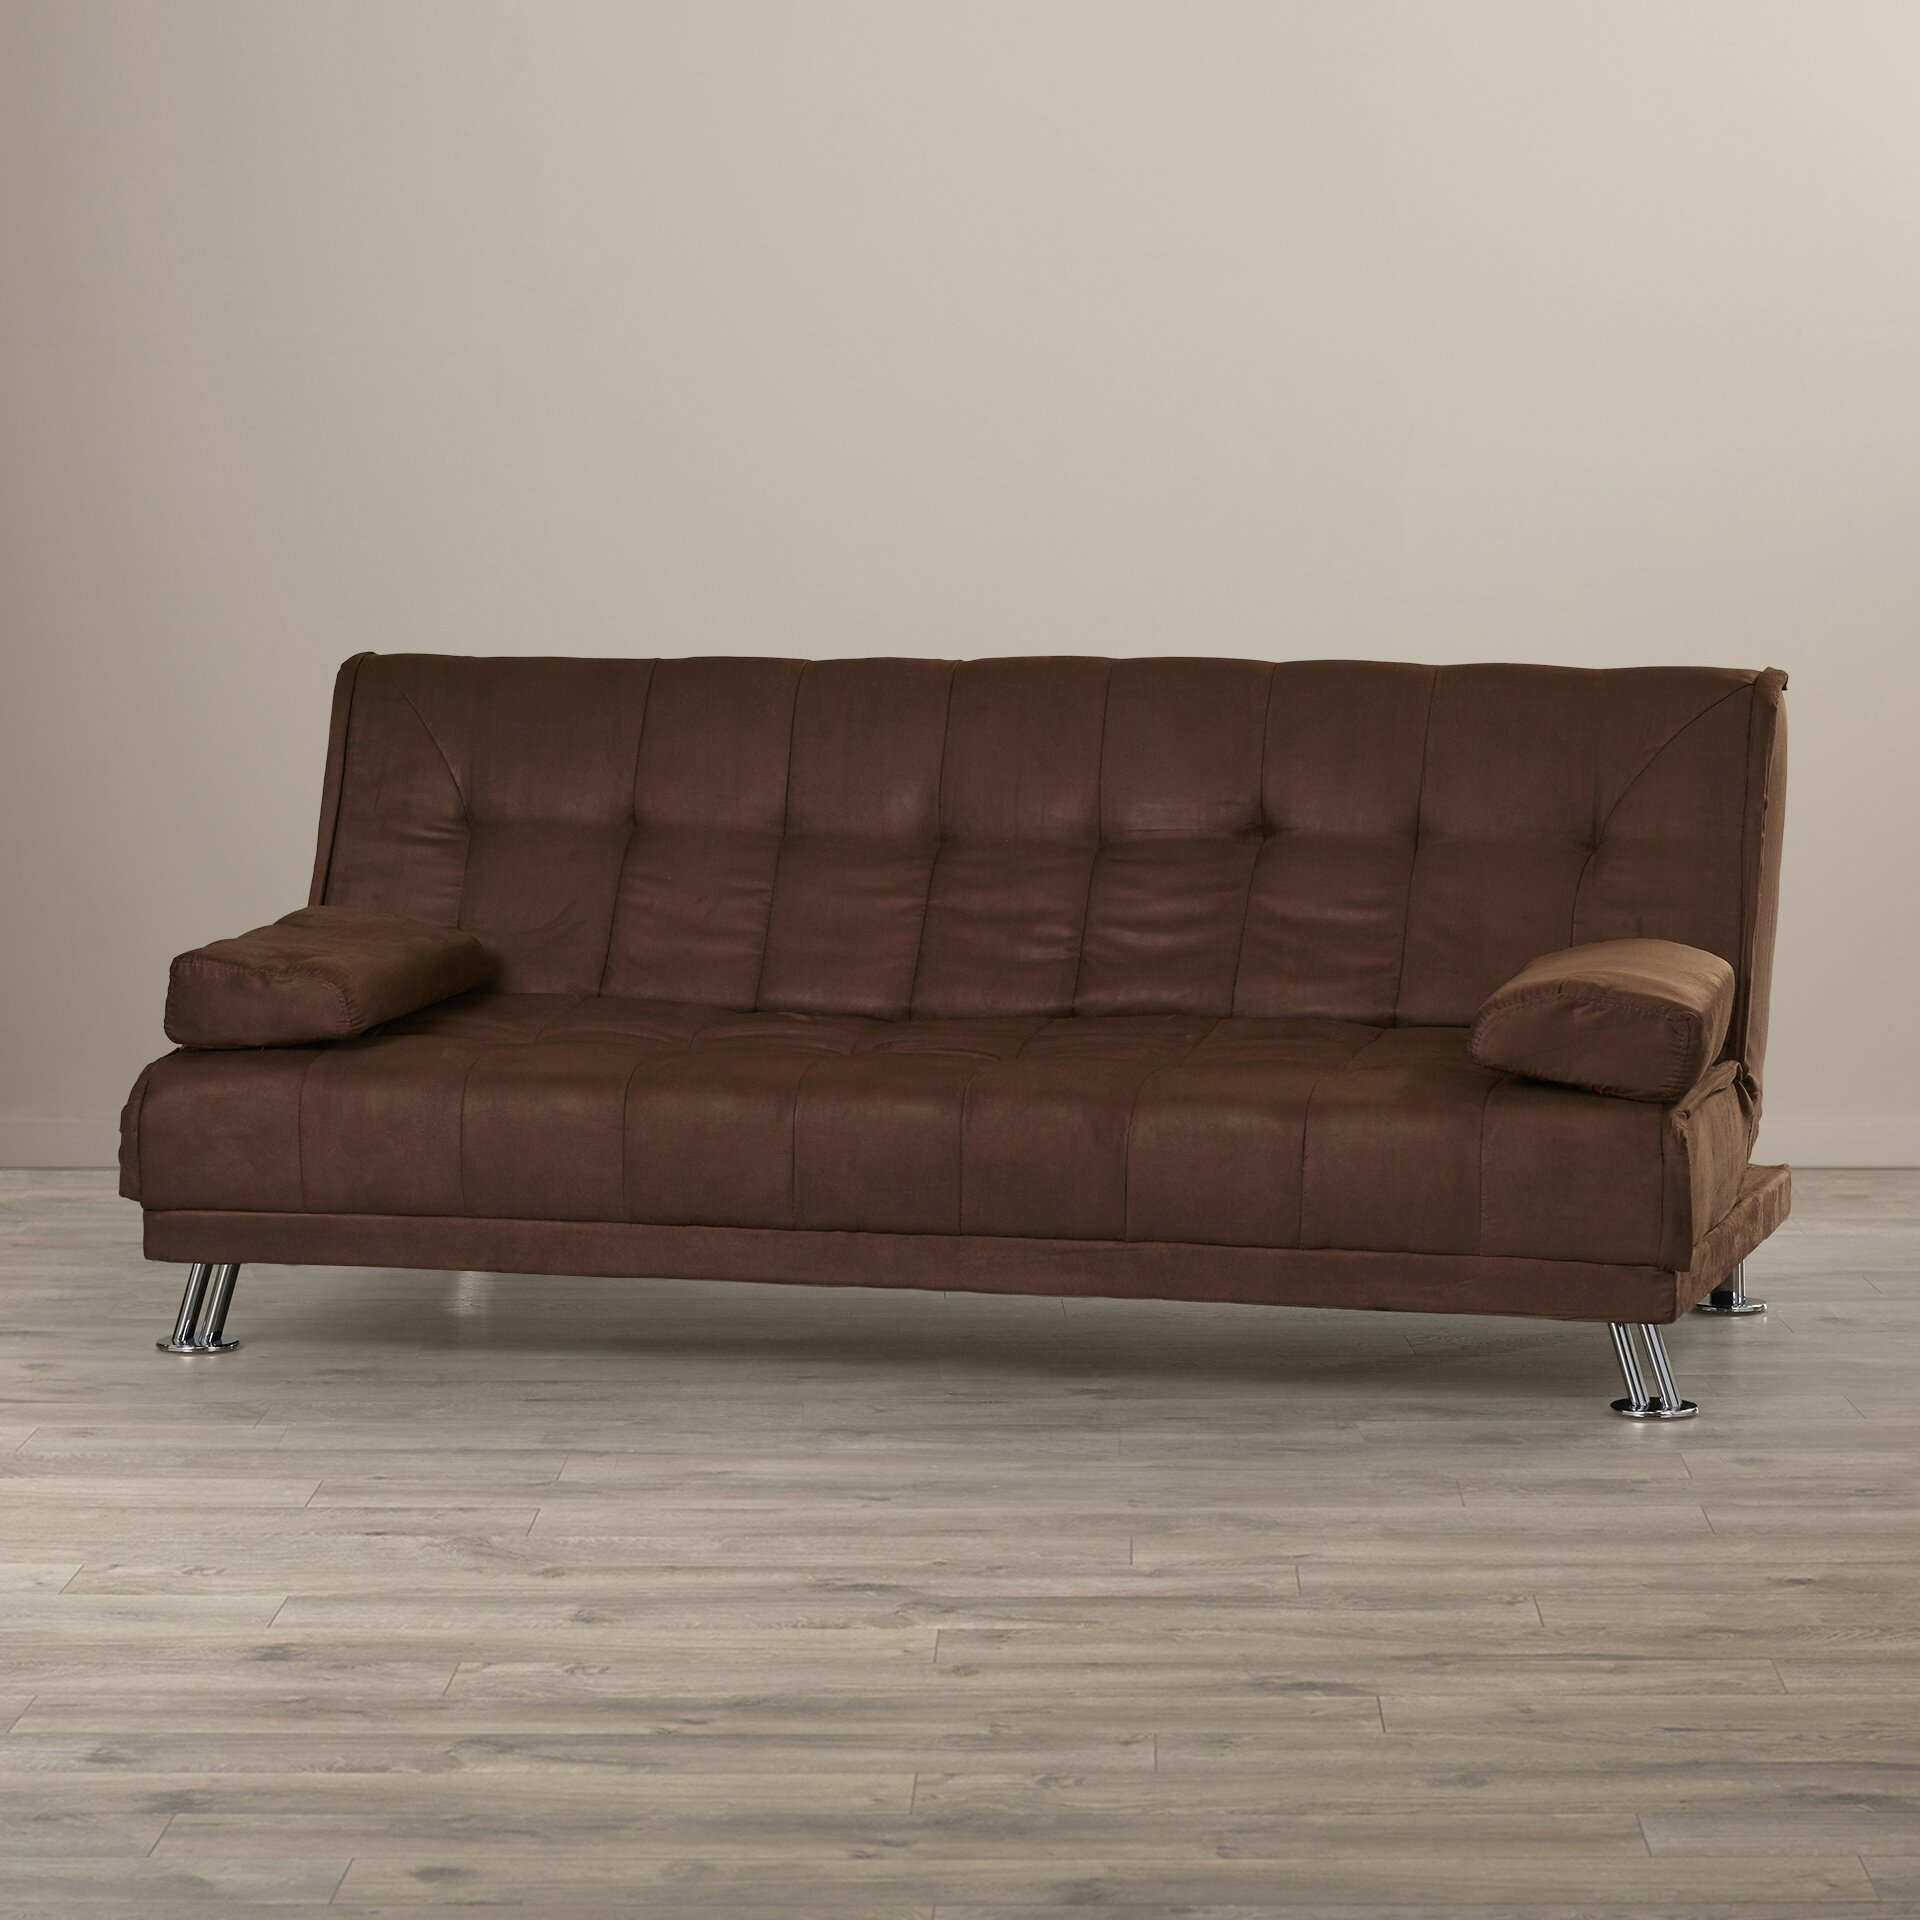 Dillards Furniture Sofa Sleepers